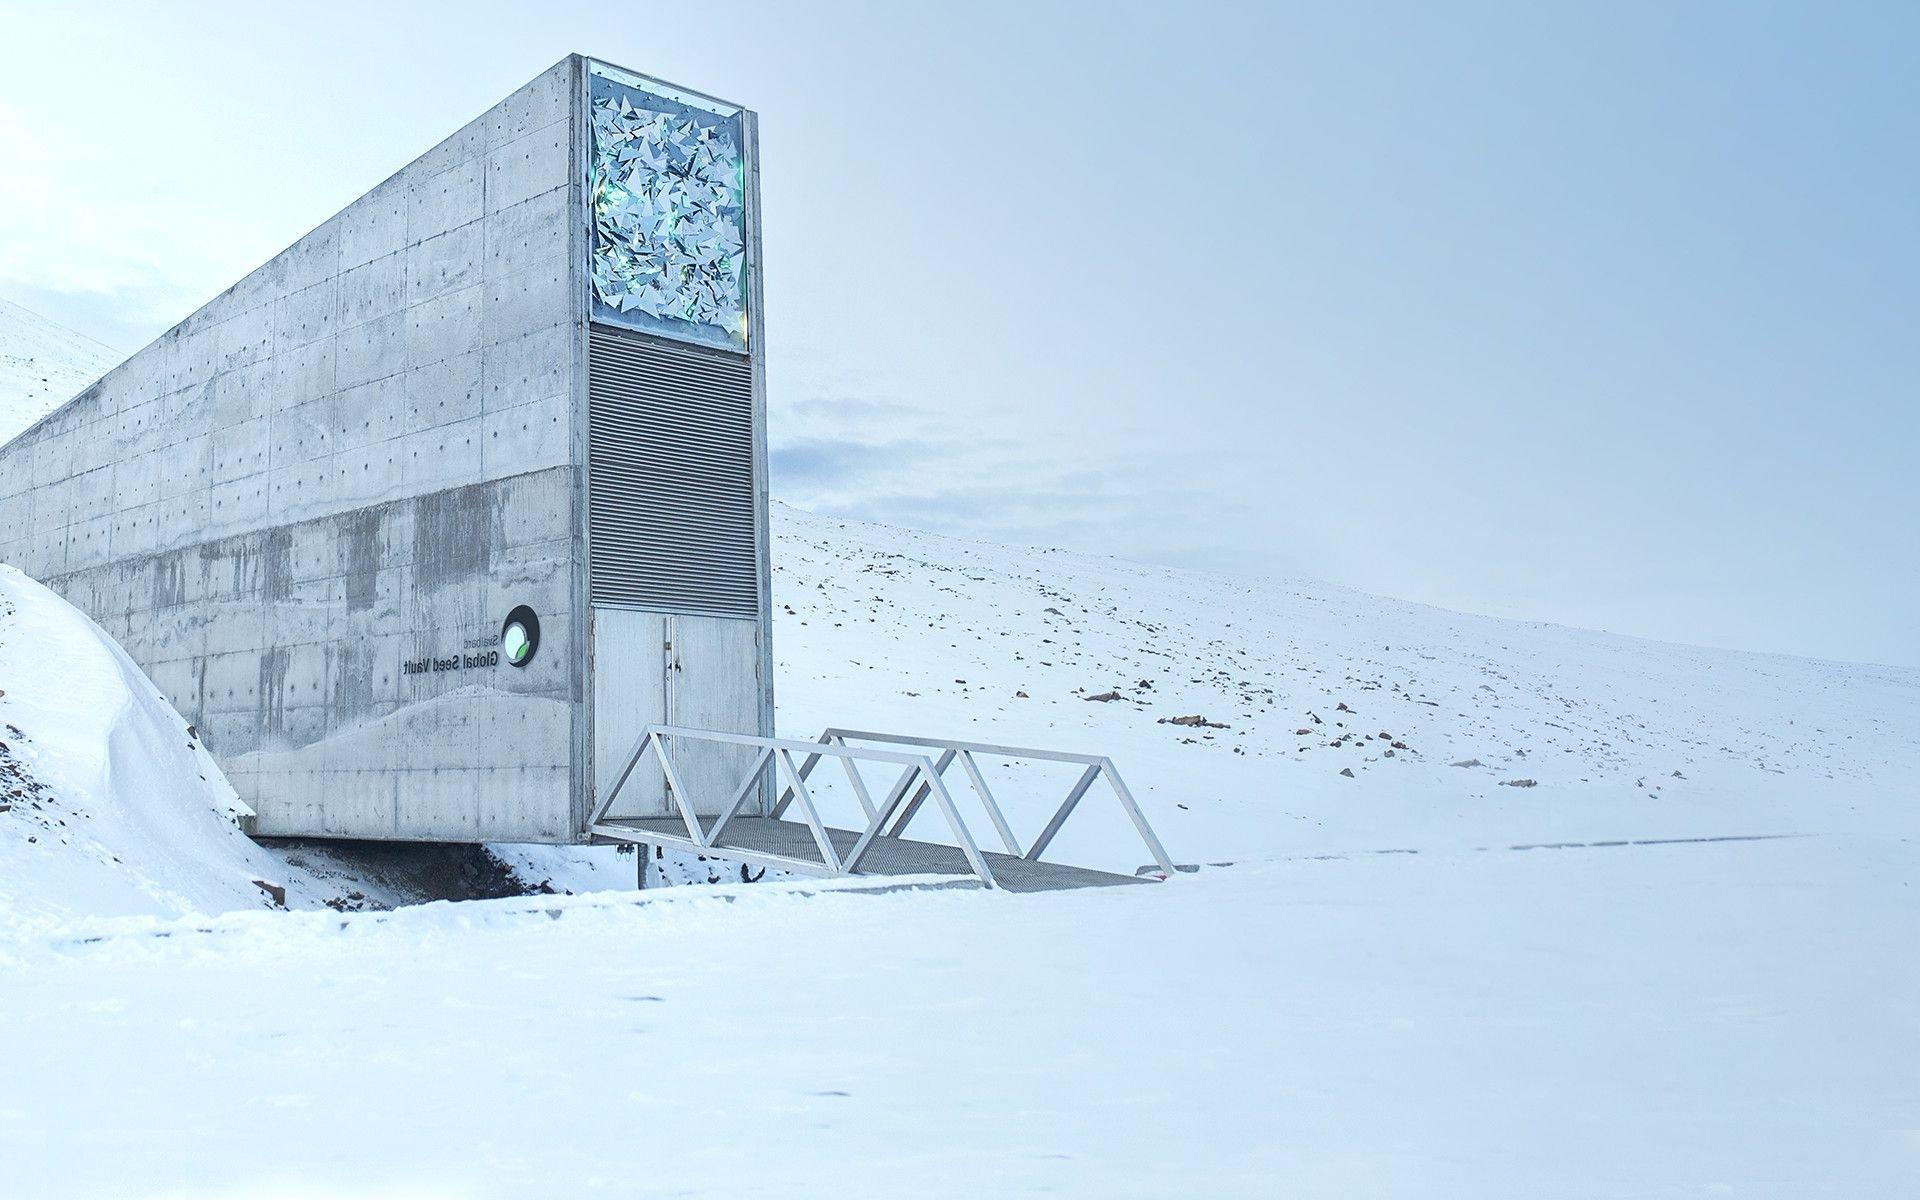 csm_Svalbard_Global_Seed_Vault_f25d850445